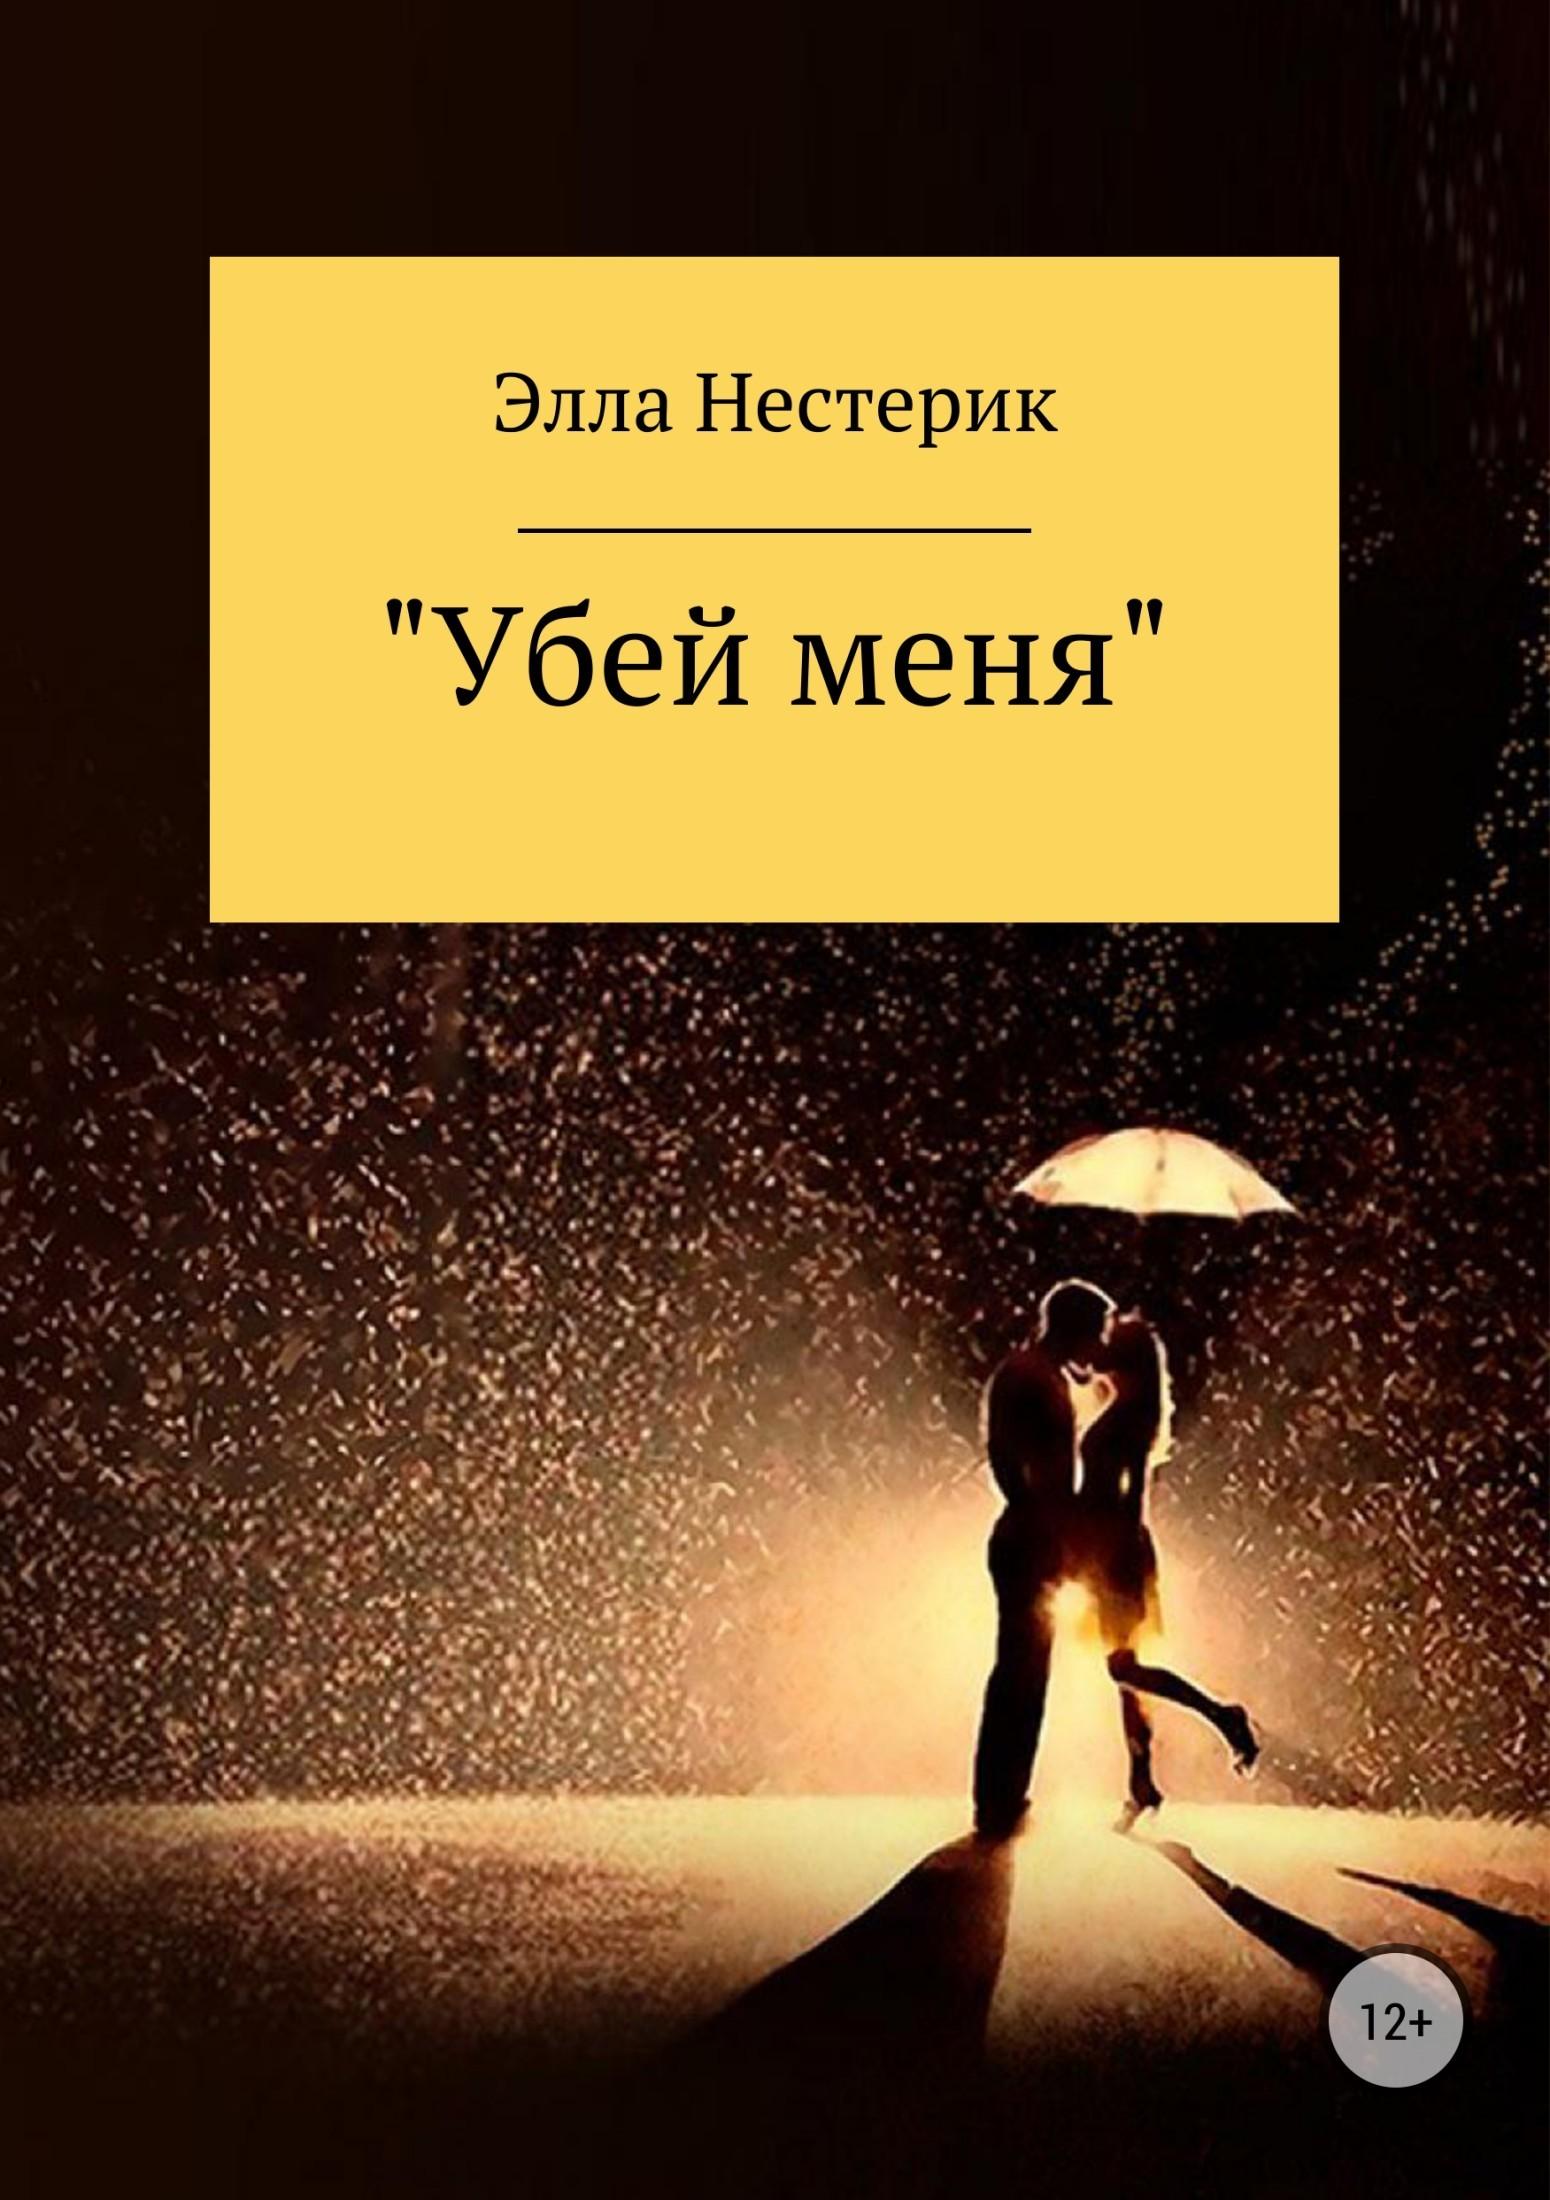 Элла Нестерик - «Убей меня»